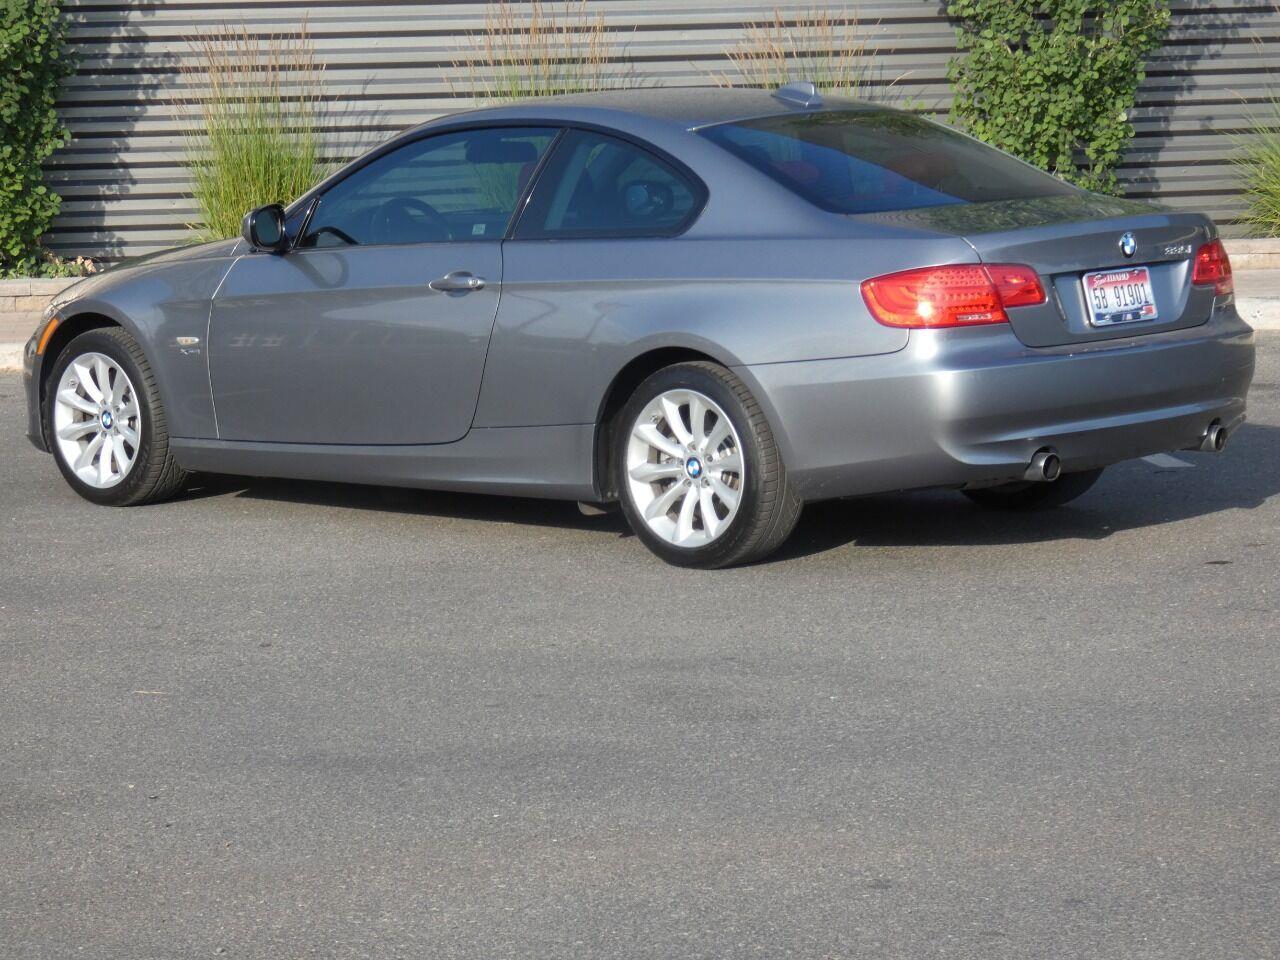 2011 BMW 3 Series (CC-1421188) for sale in Hailey, Idaho